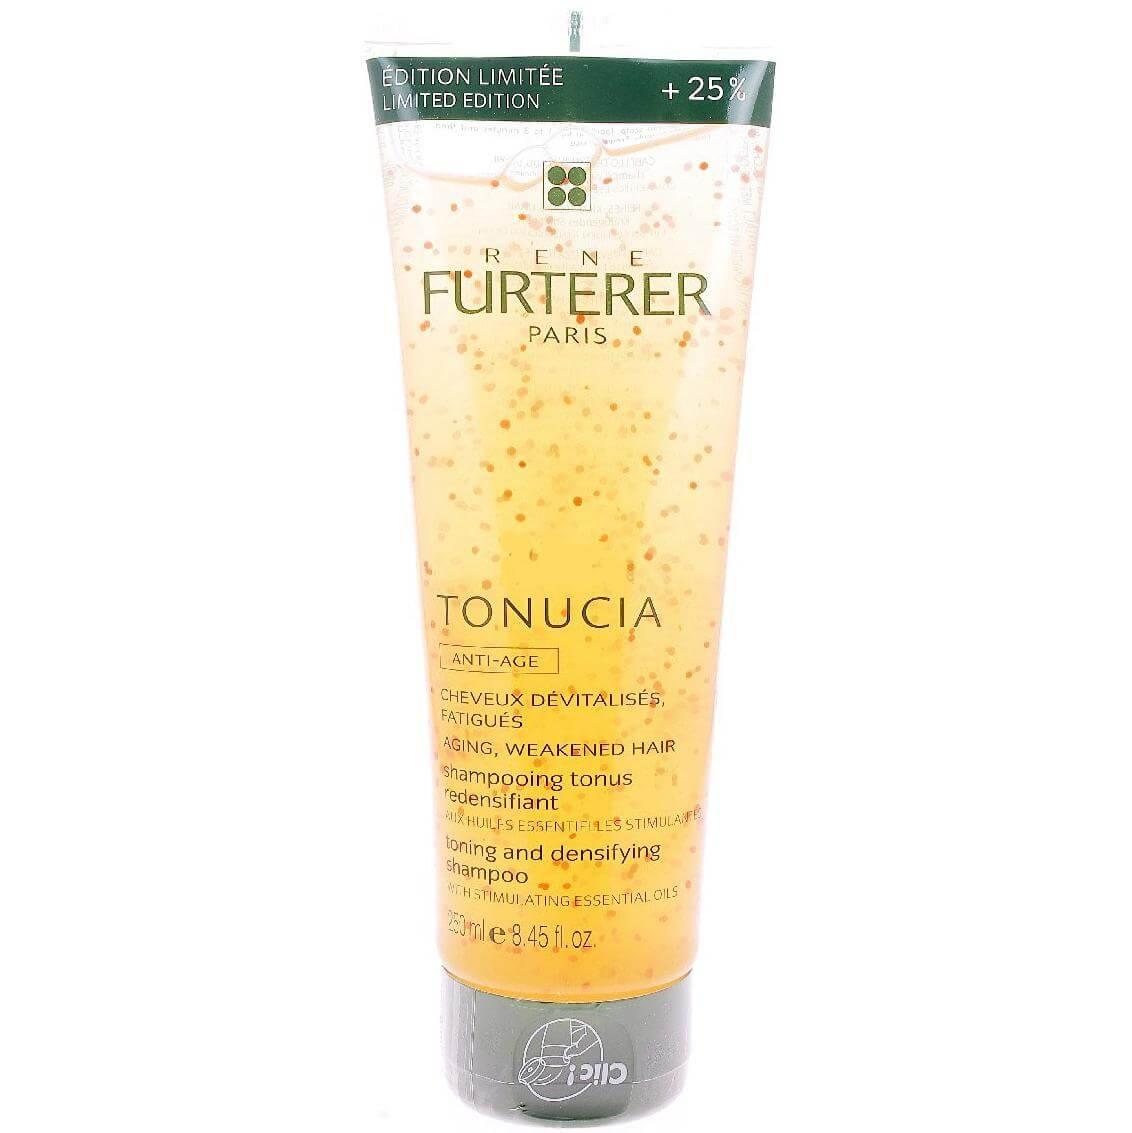 Rene Furterer Tonucia Shampooing Tonus Redensifiant Σαμπουάν για Κουρασμένα, Άτονα Μαλλιά 25% Offerts Limited Edition 250ml